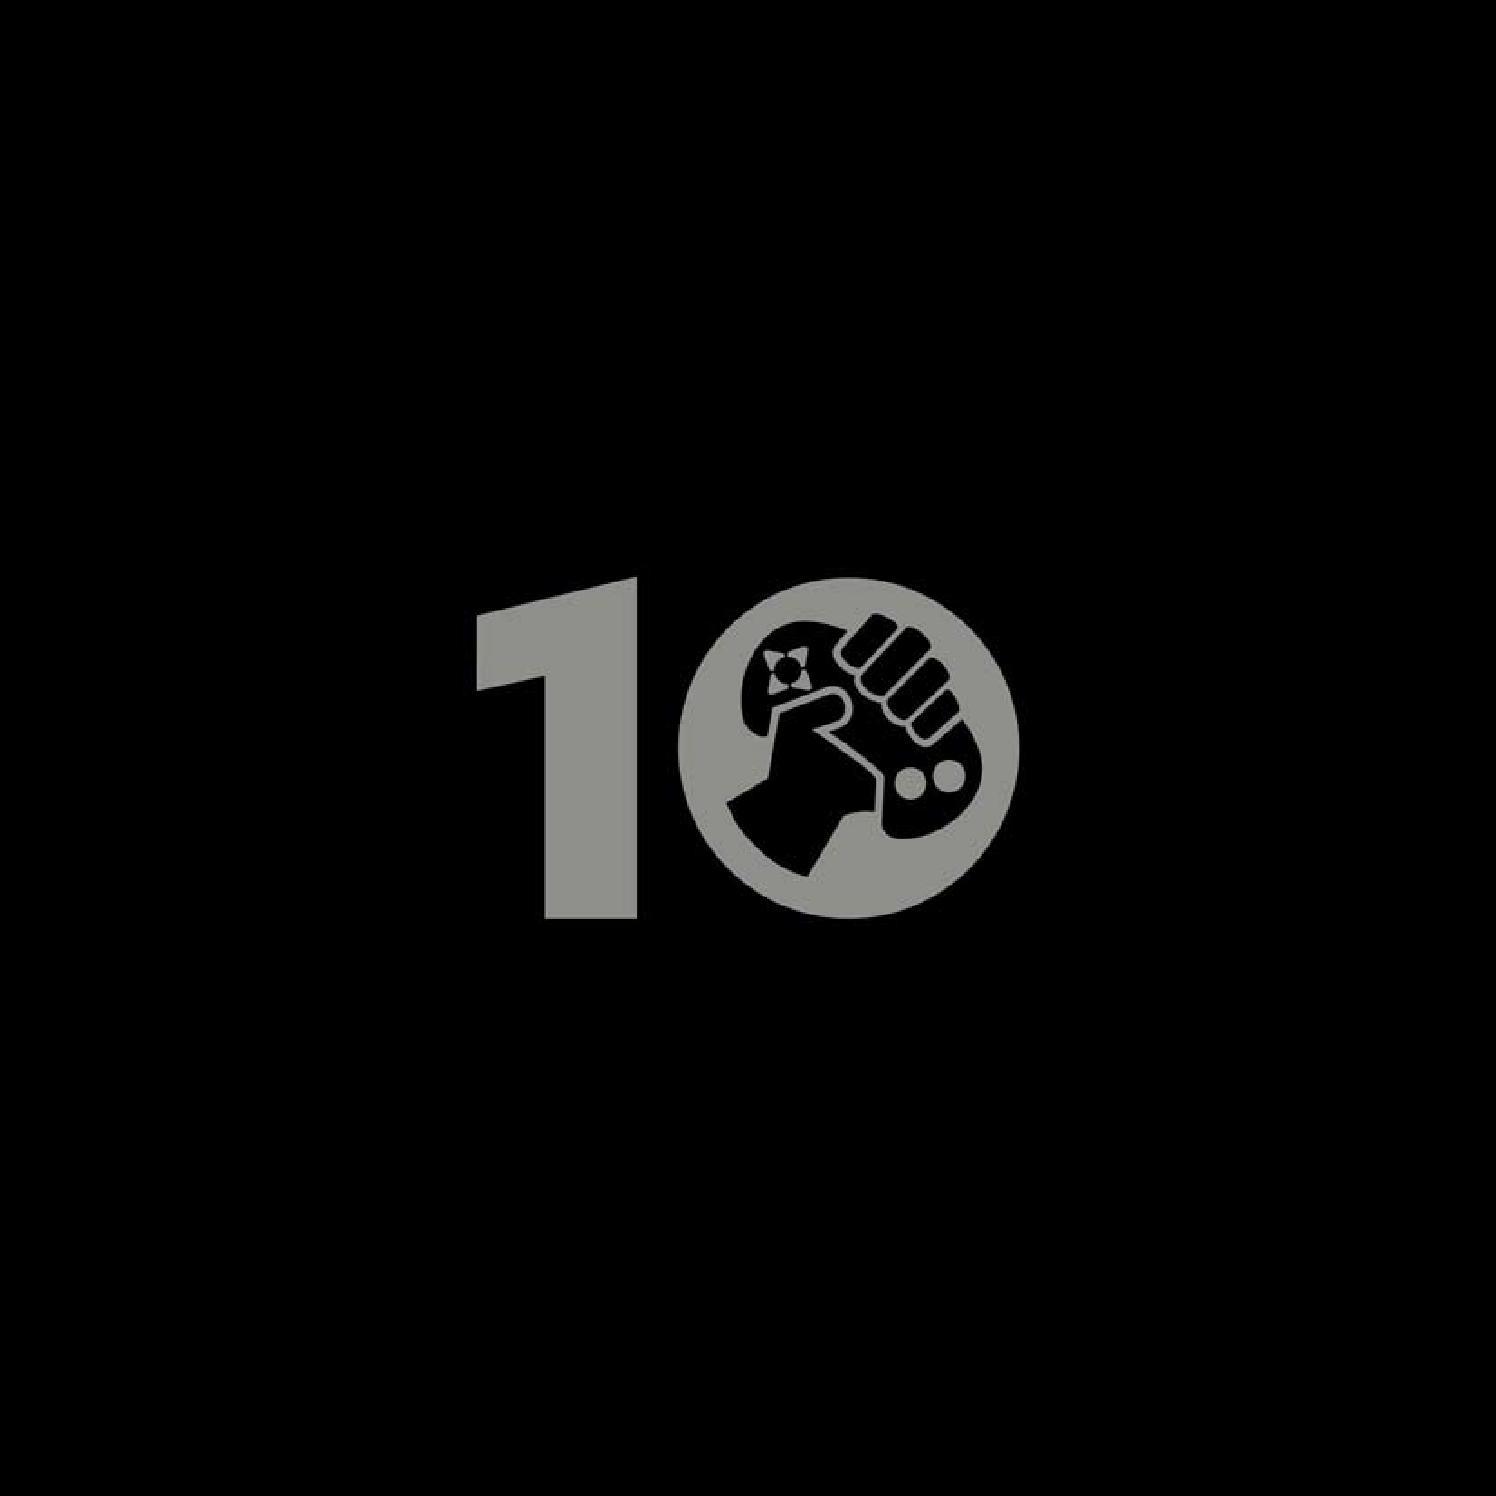 MeriStation 10.º aniversario . Revista impresa inédita by Emilio Peña -  issuu 33073fa78d3